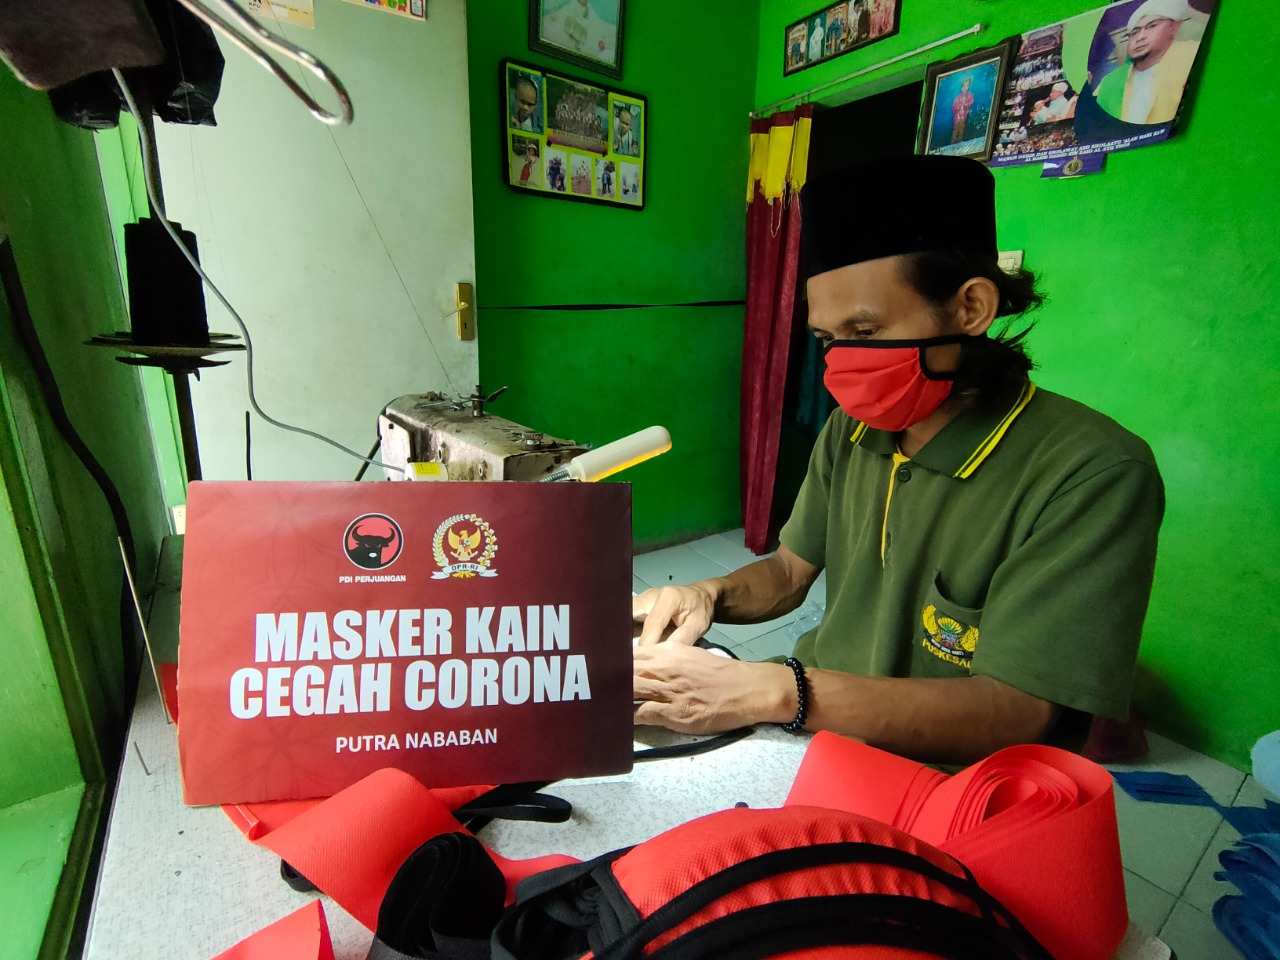 Gerakan Pemberdayaan UKM Jaktim Produksi Masker Kain untuk Warga